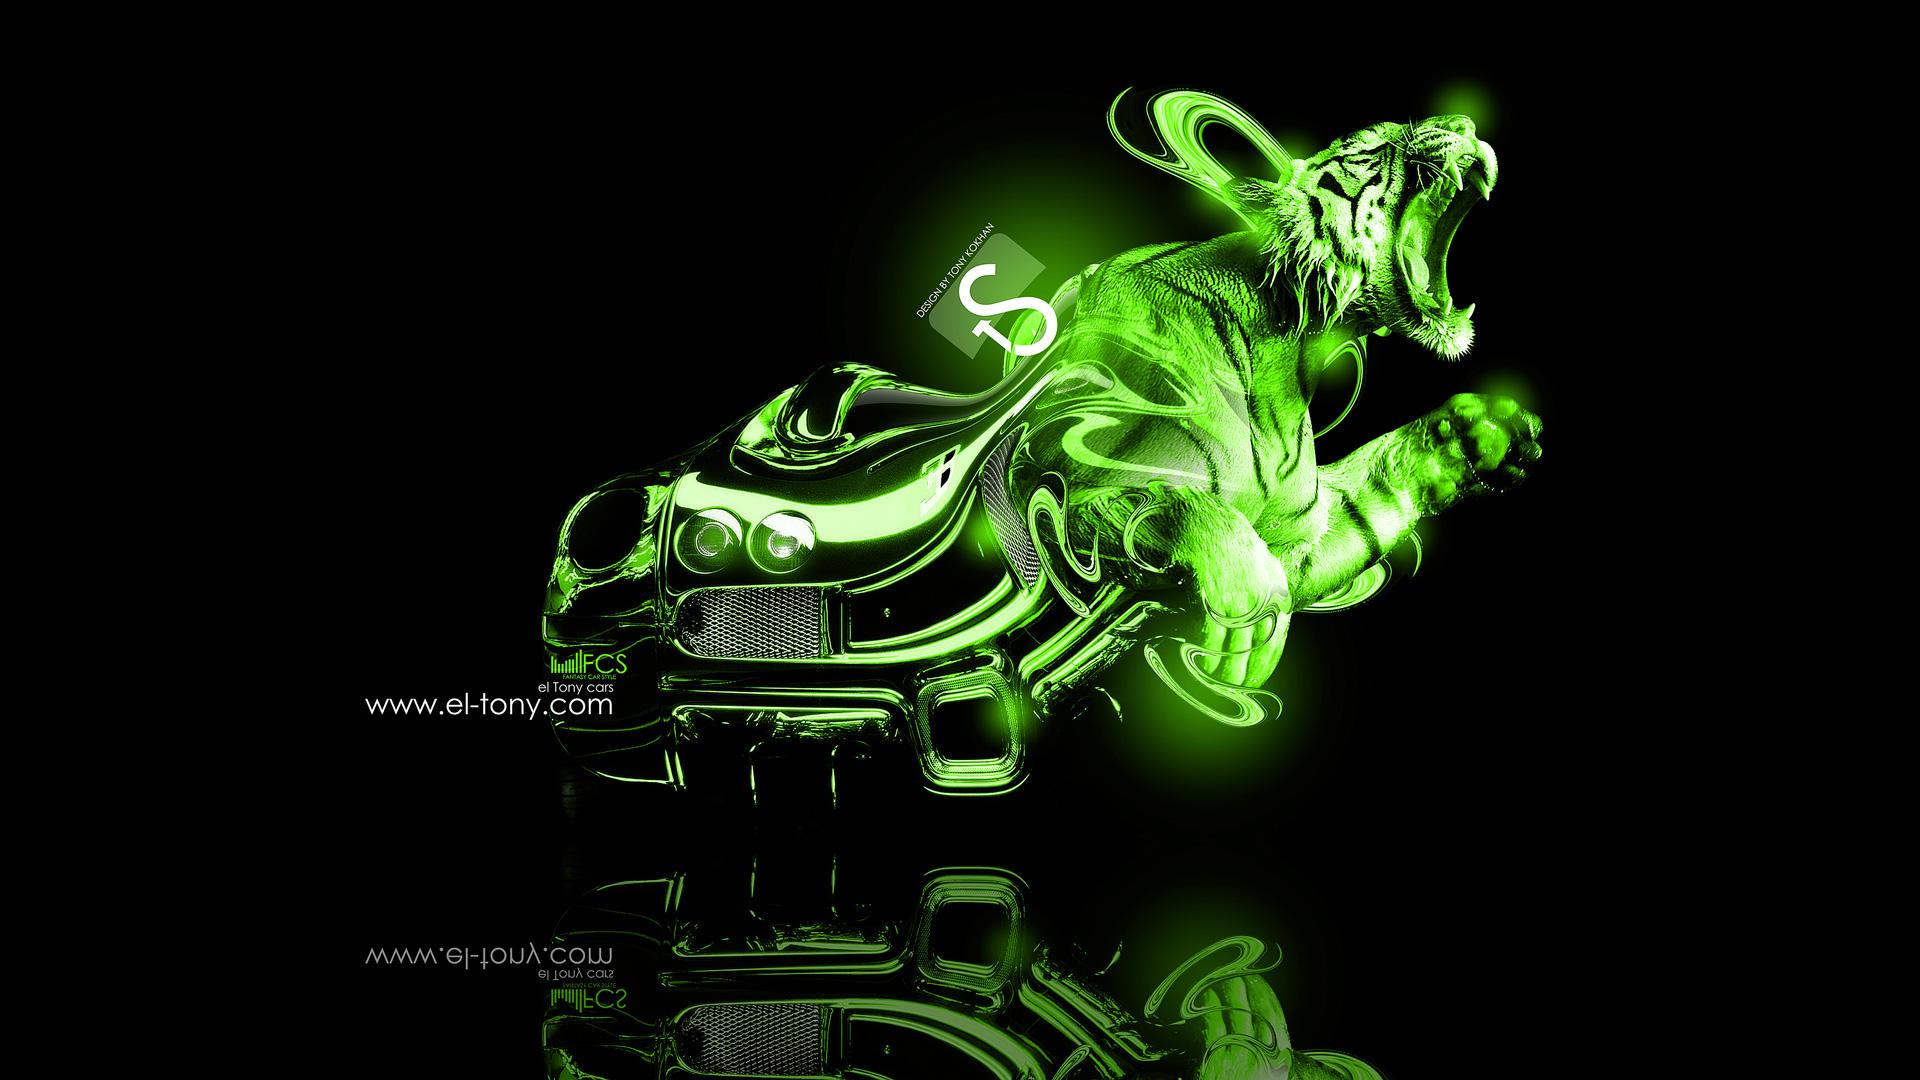 Neon Green Wallpaper Design Bugatti veyron gold tiger 2013 1920x1080